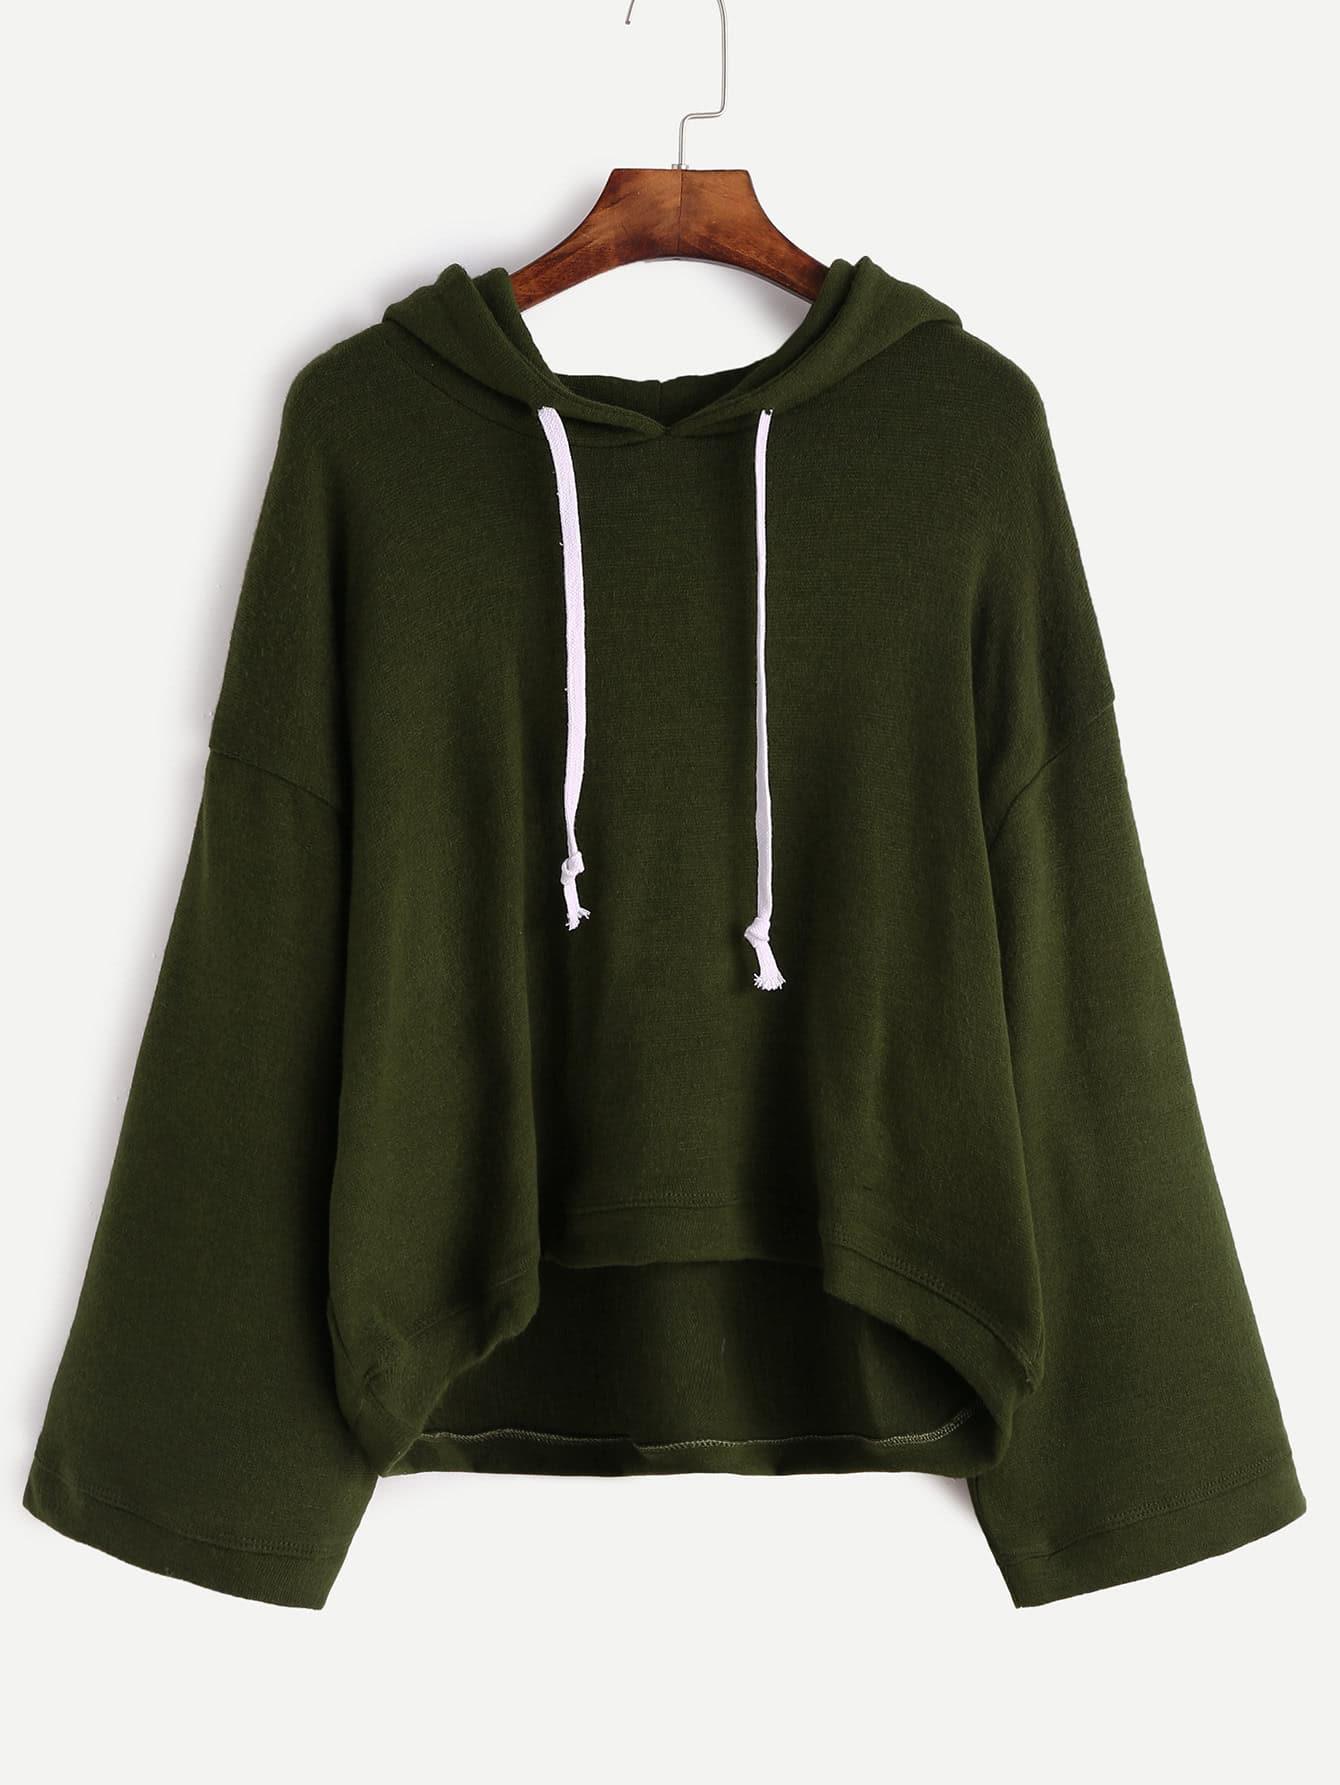 Dark Green Drop Shoulder Drawstring Hooded Sweater two tone drop shoulder sweatshirt